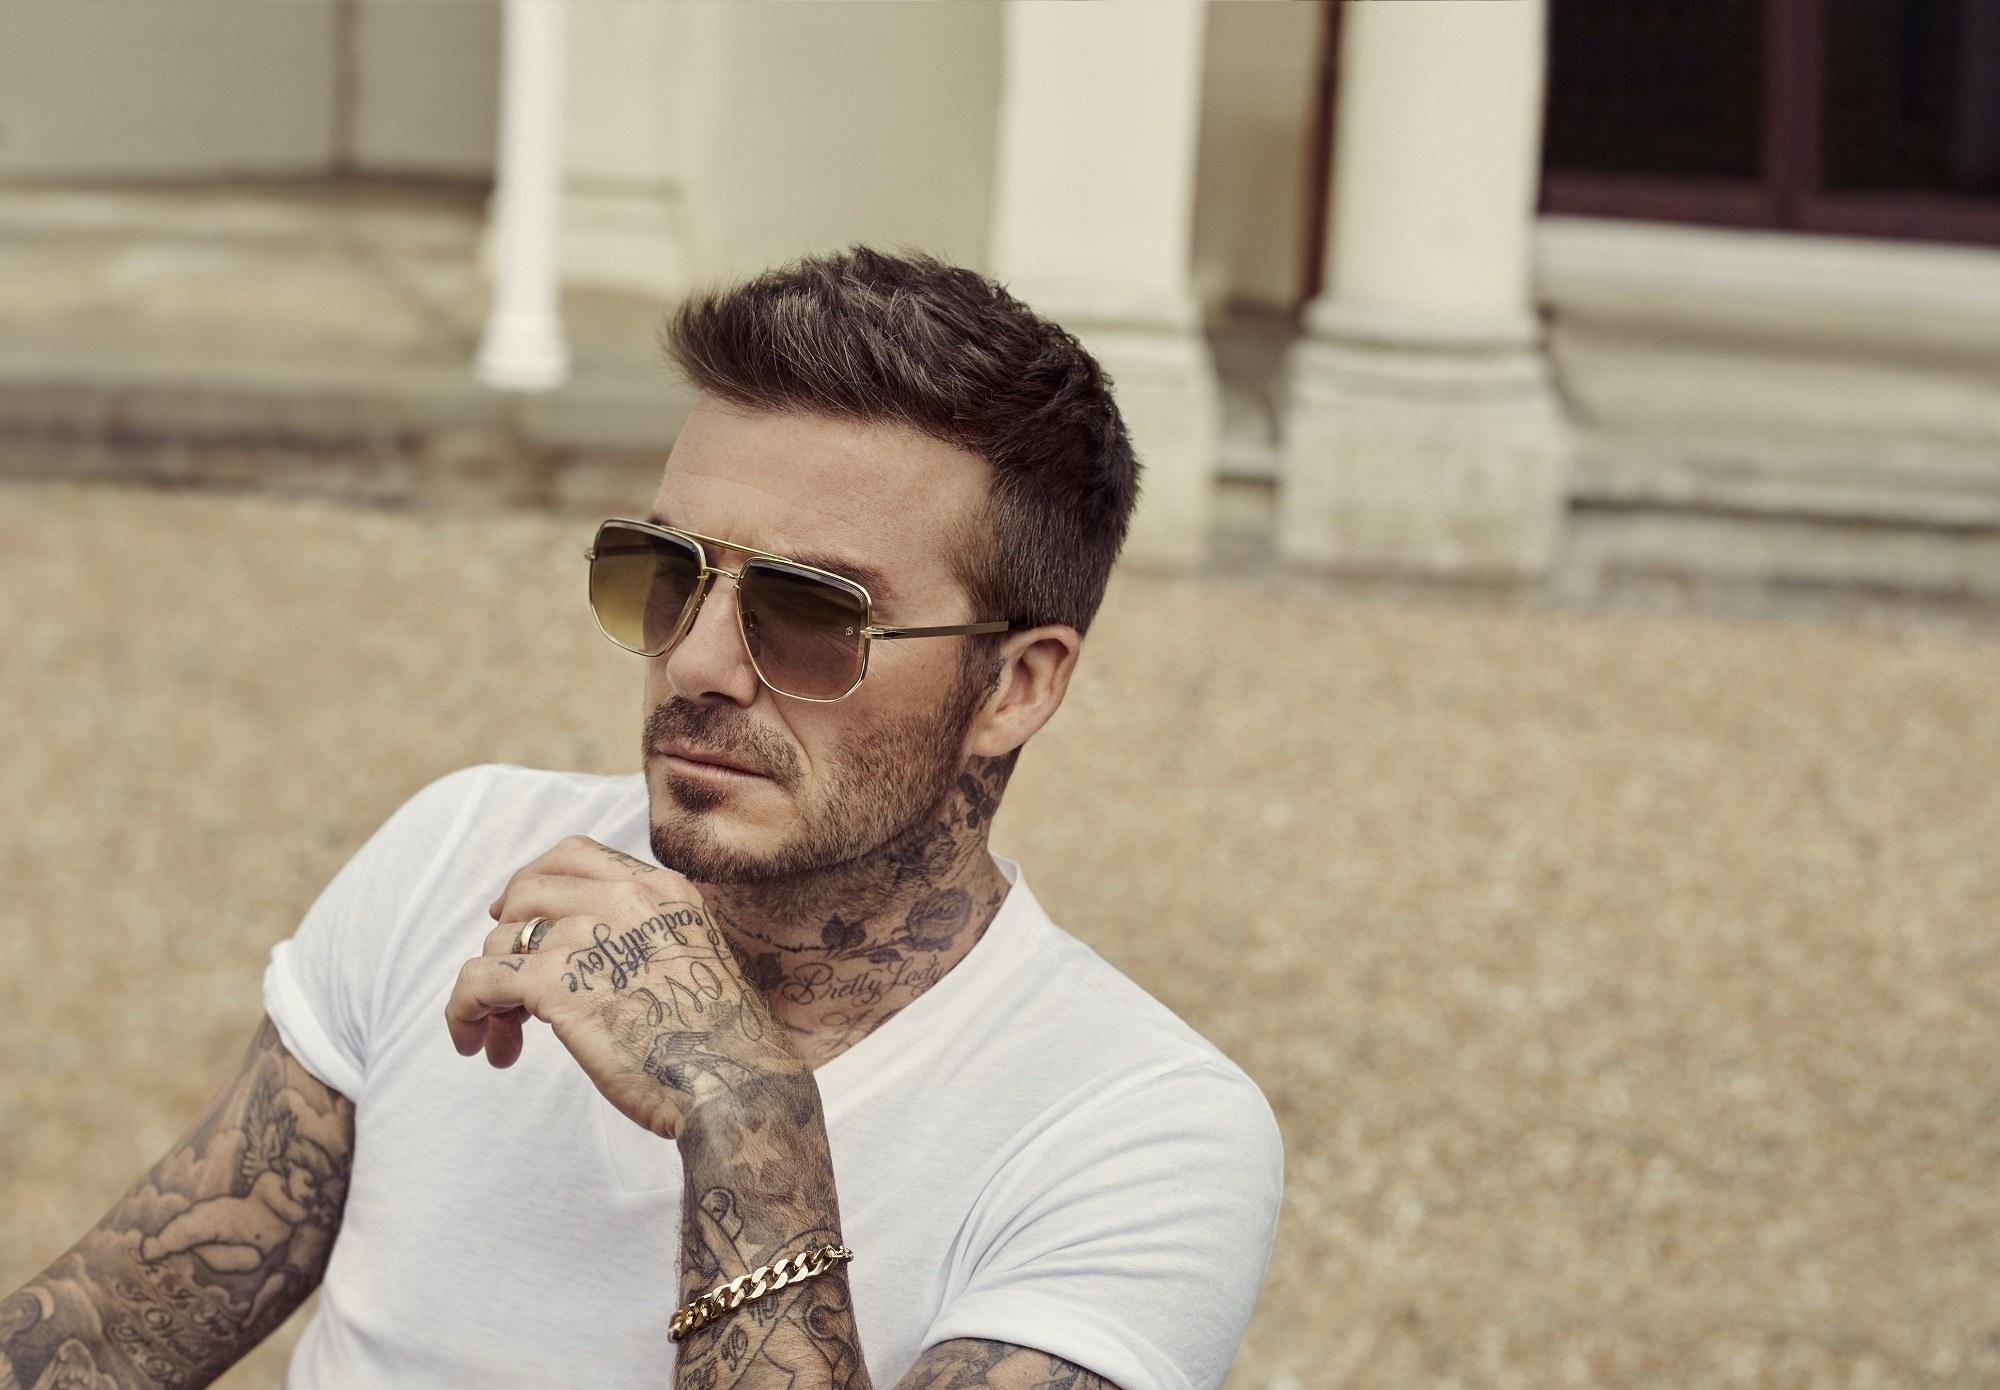 David Beckham unveils his new DB shades collection